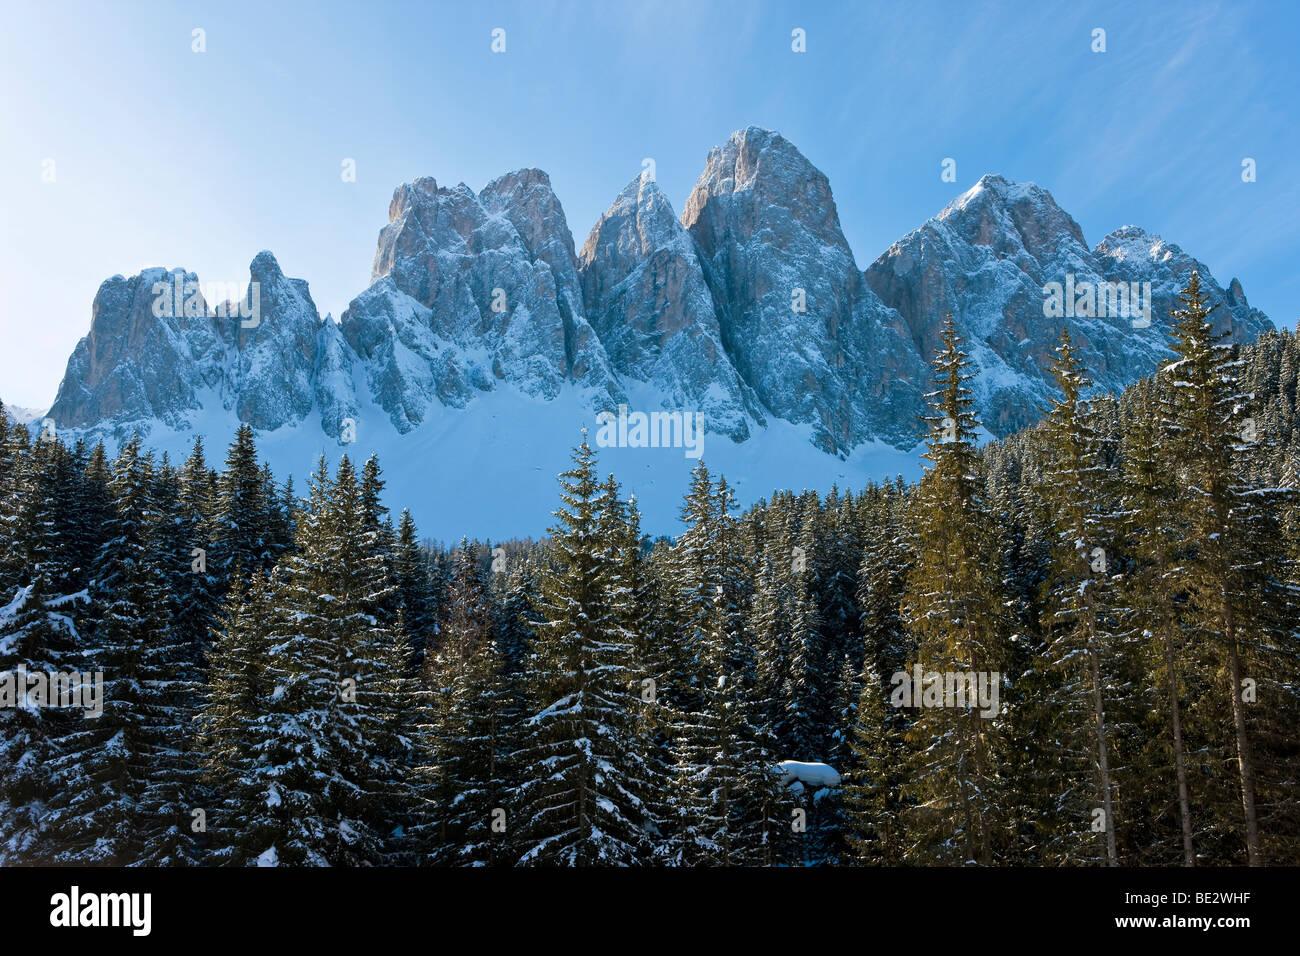 Winter landscape, Le Odle Group/Geisler Spitzen, Val di Funes, Italian Dolomites mountains, Trentino-Alto Adige, - Stock Image